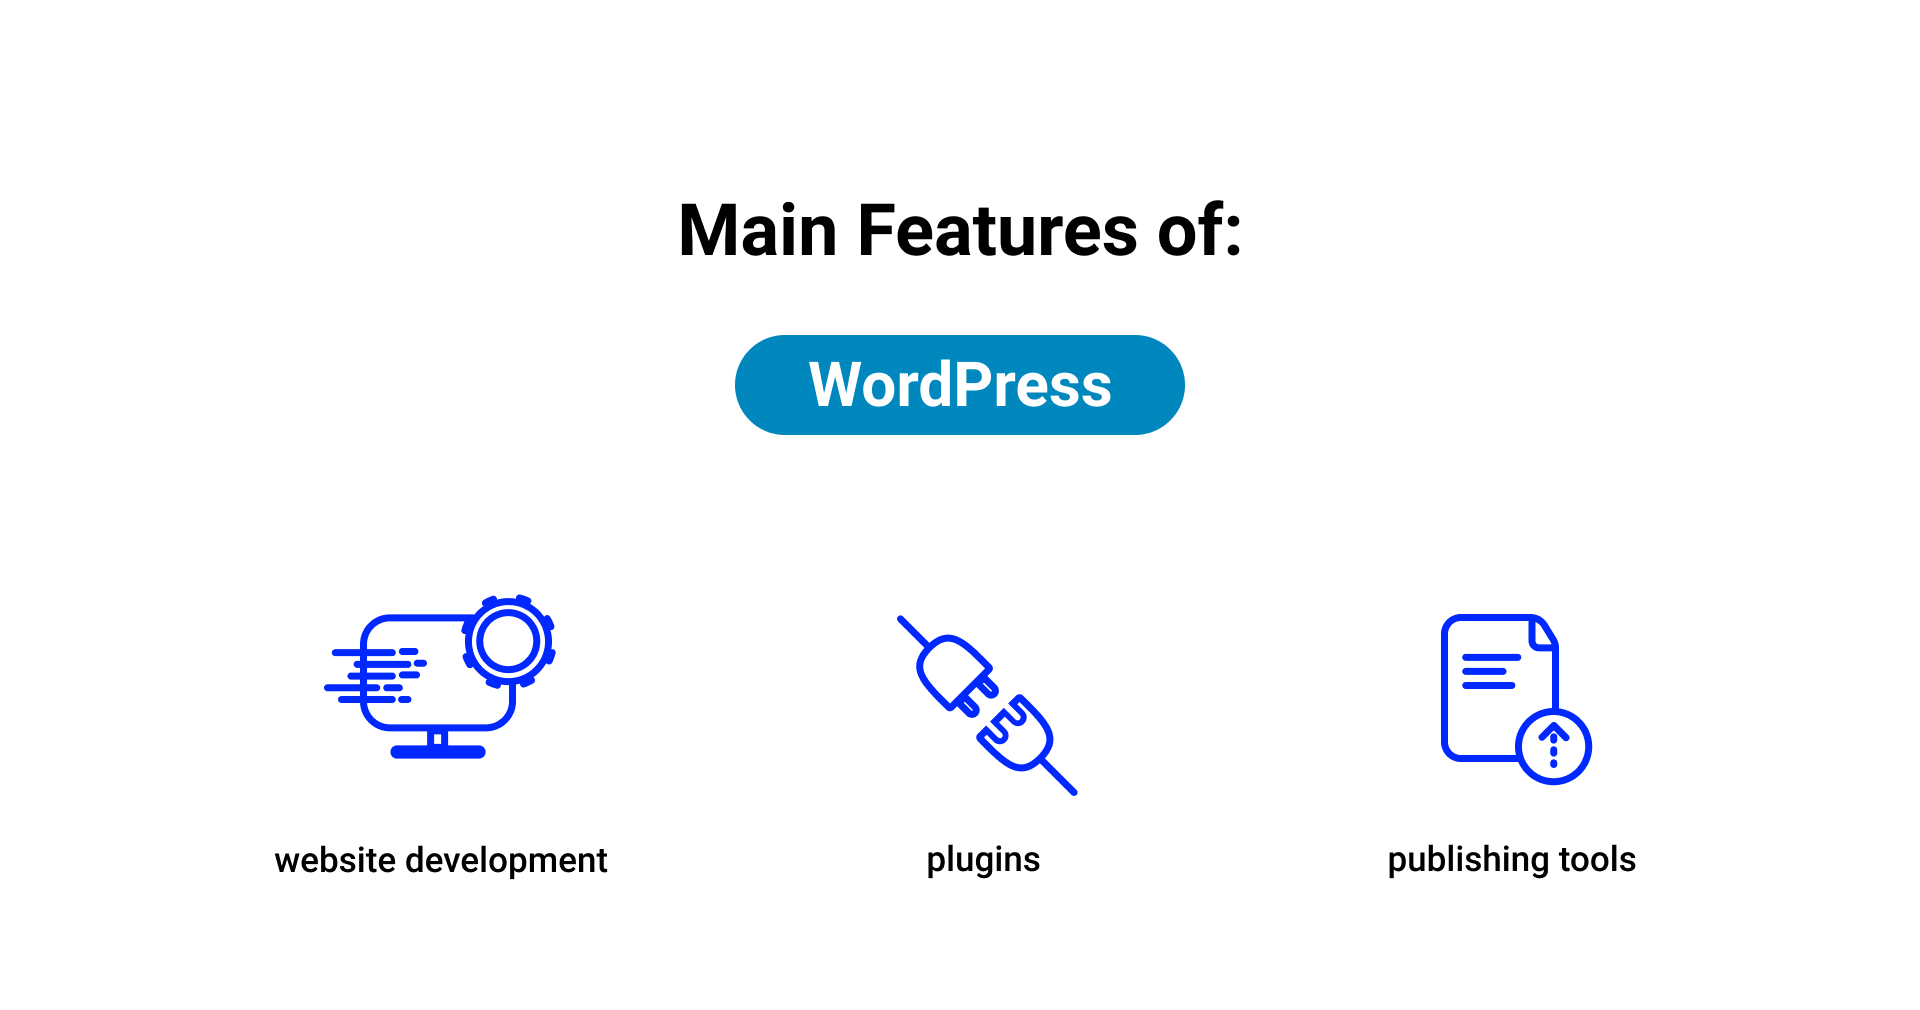 main features of wordpress